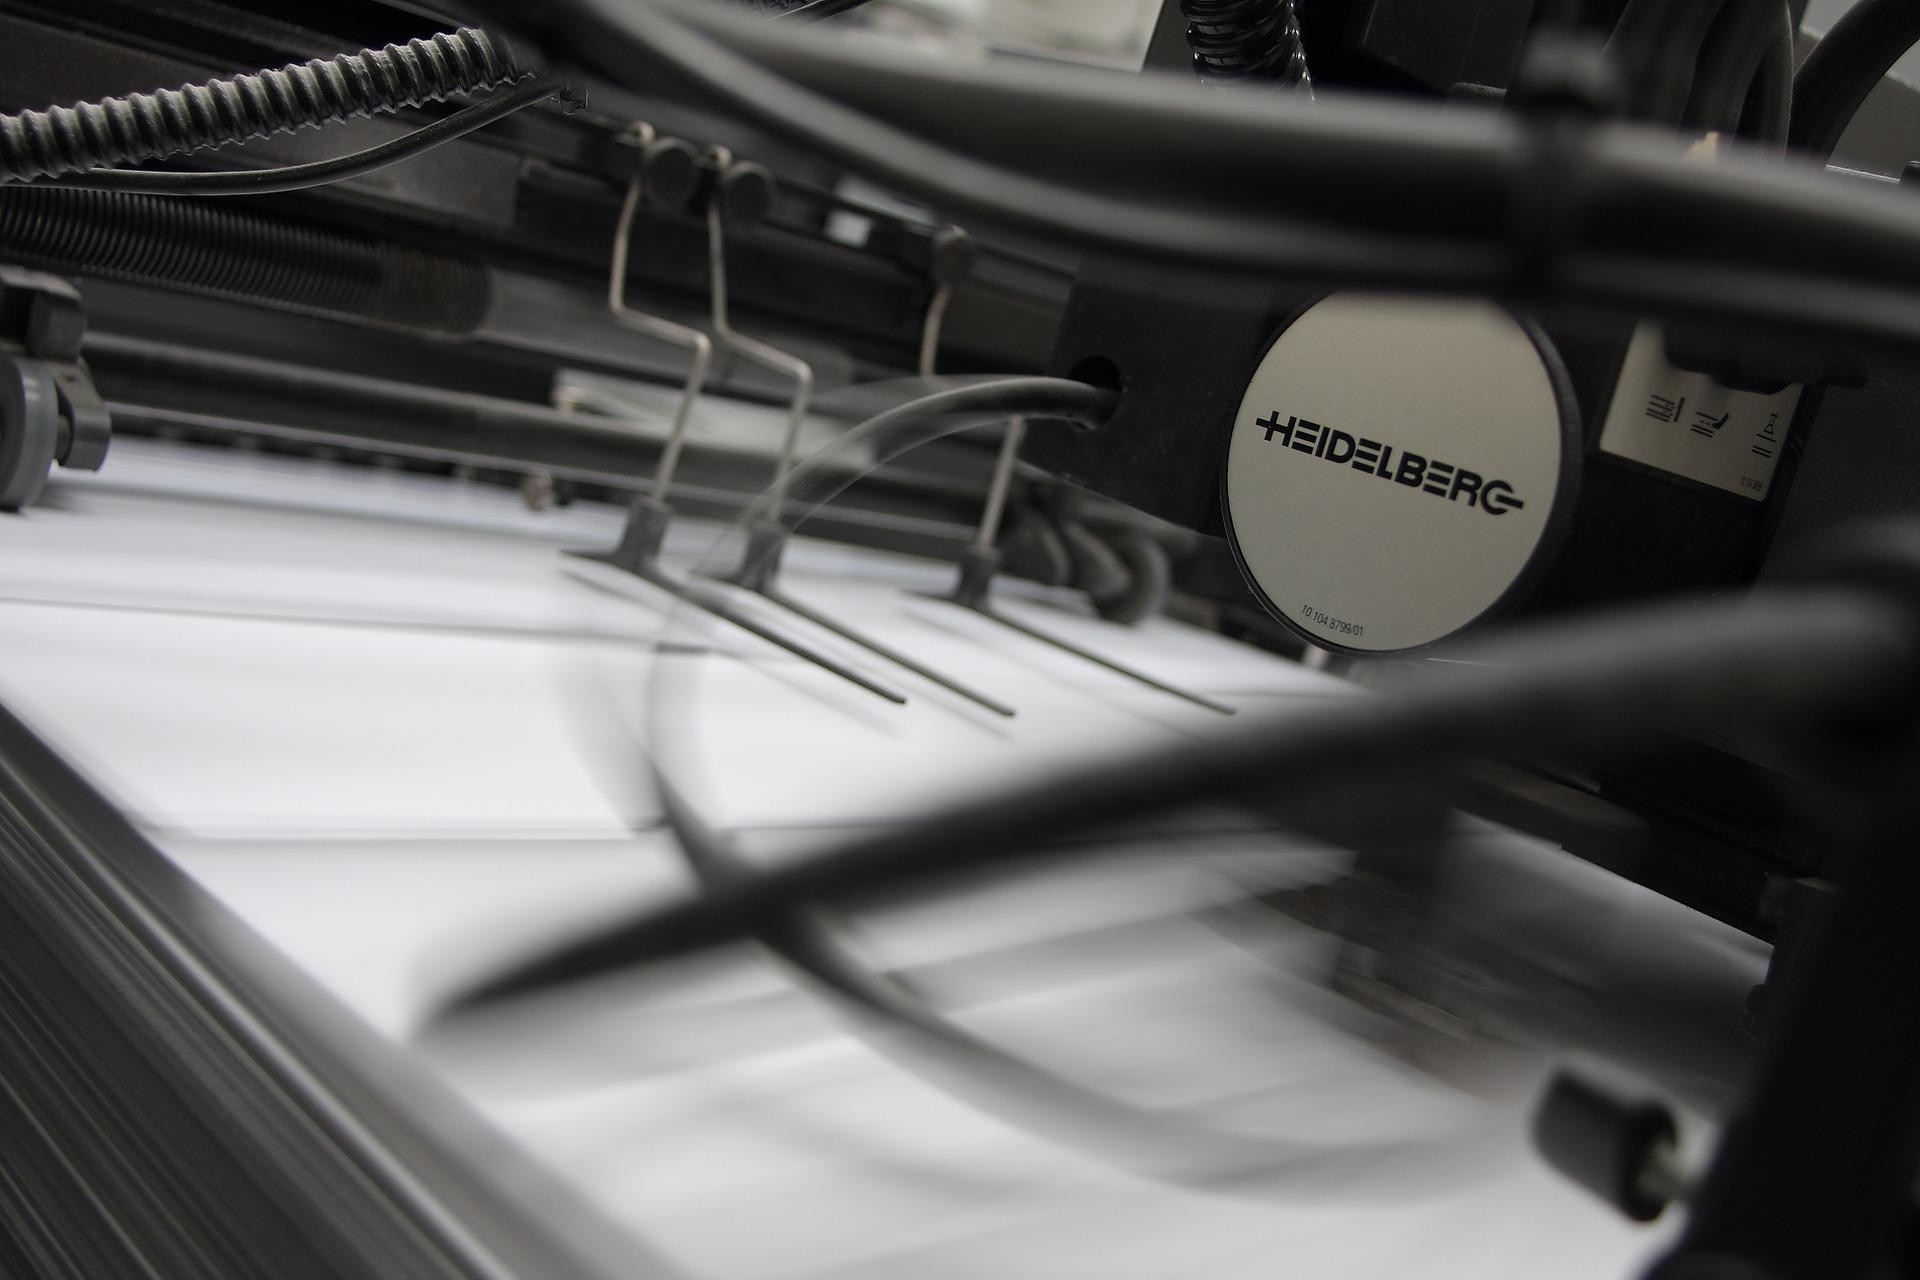 669 Printing